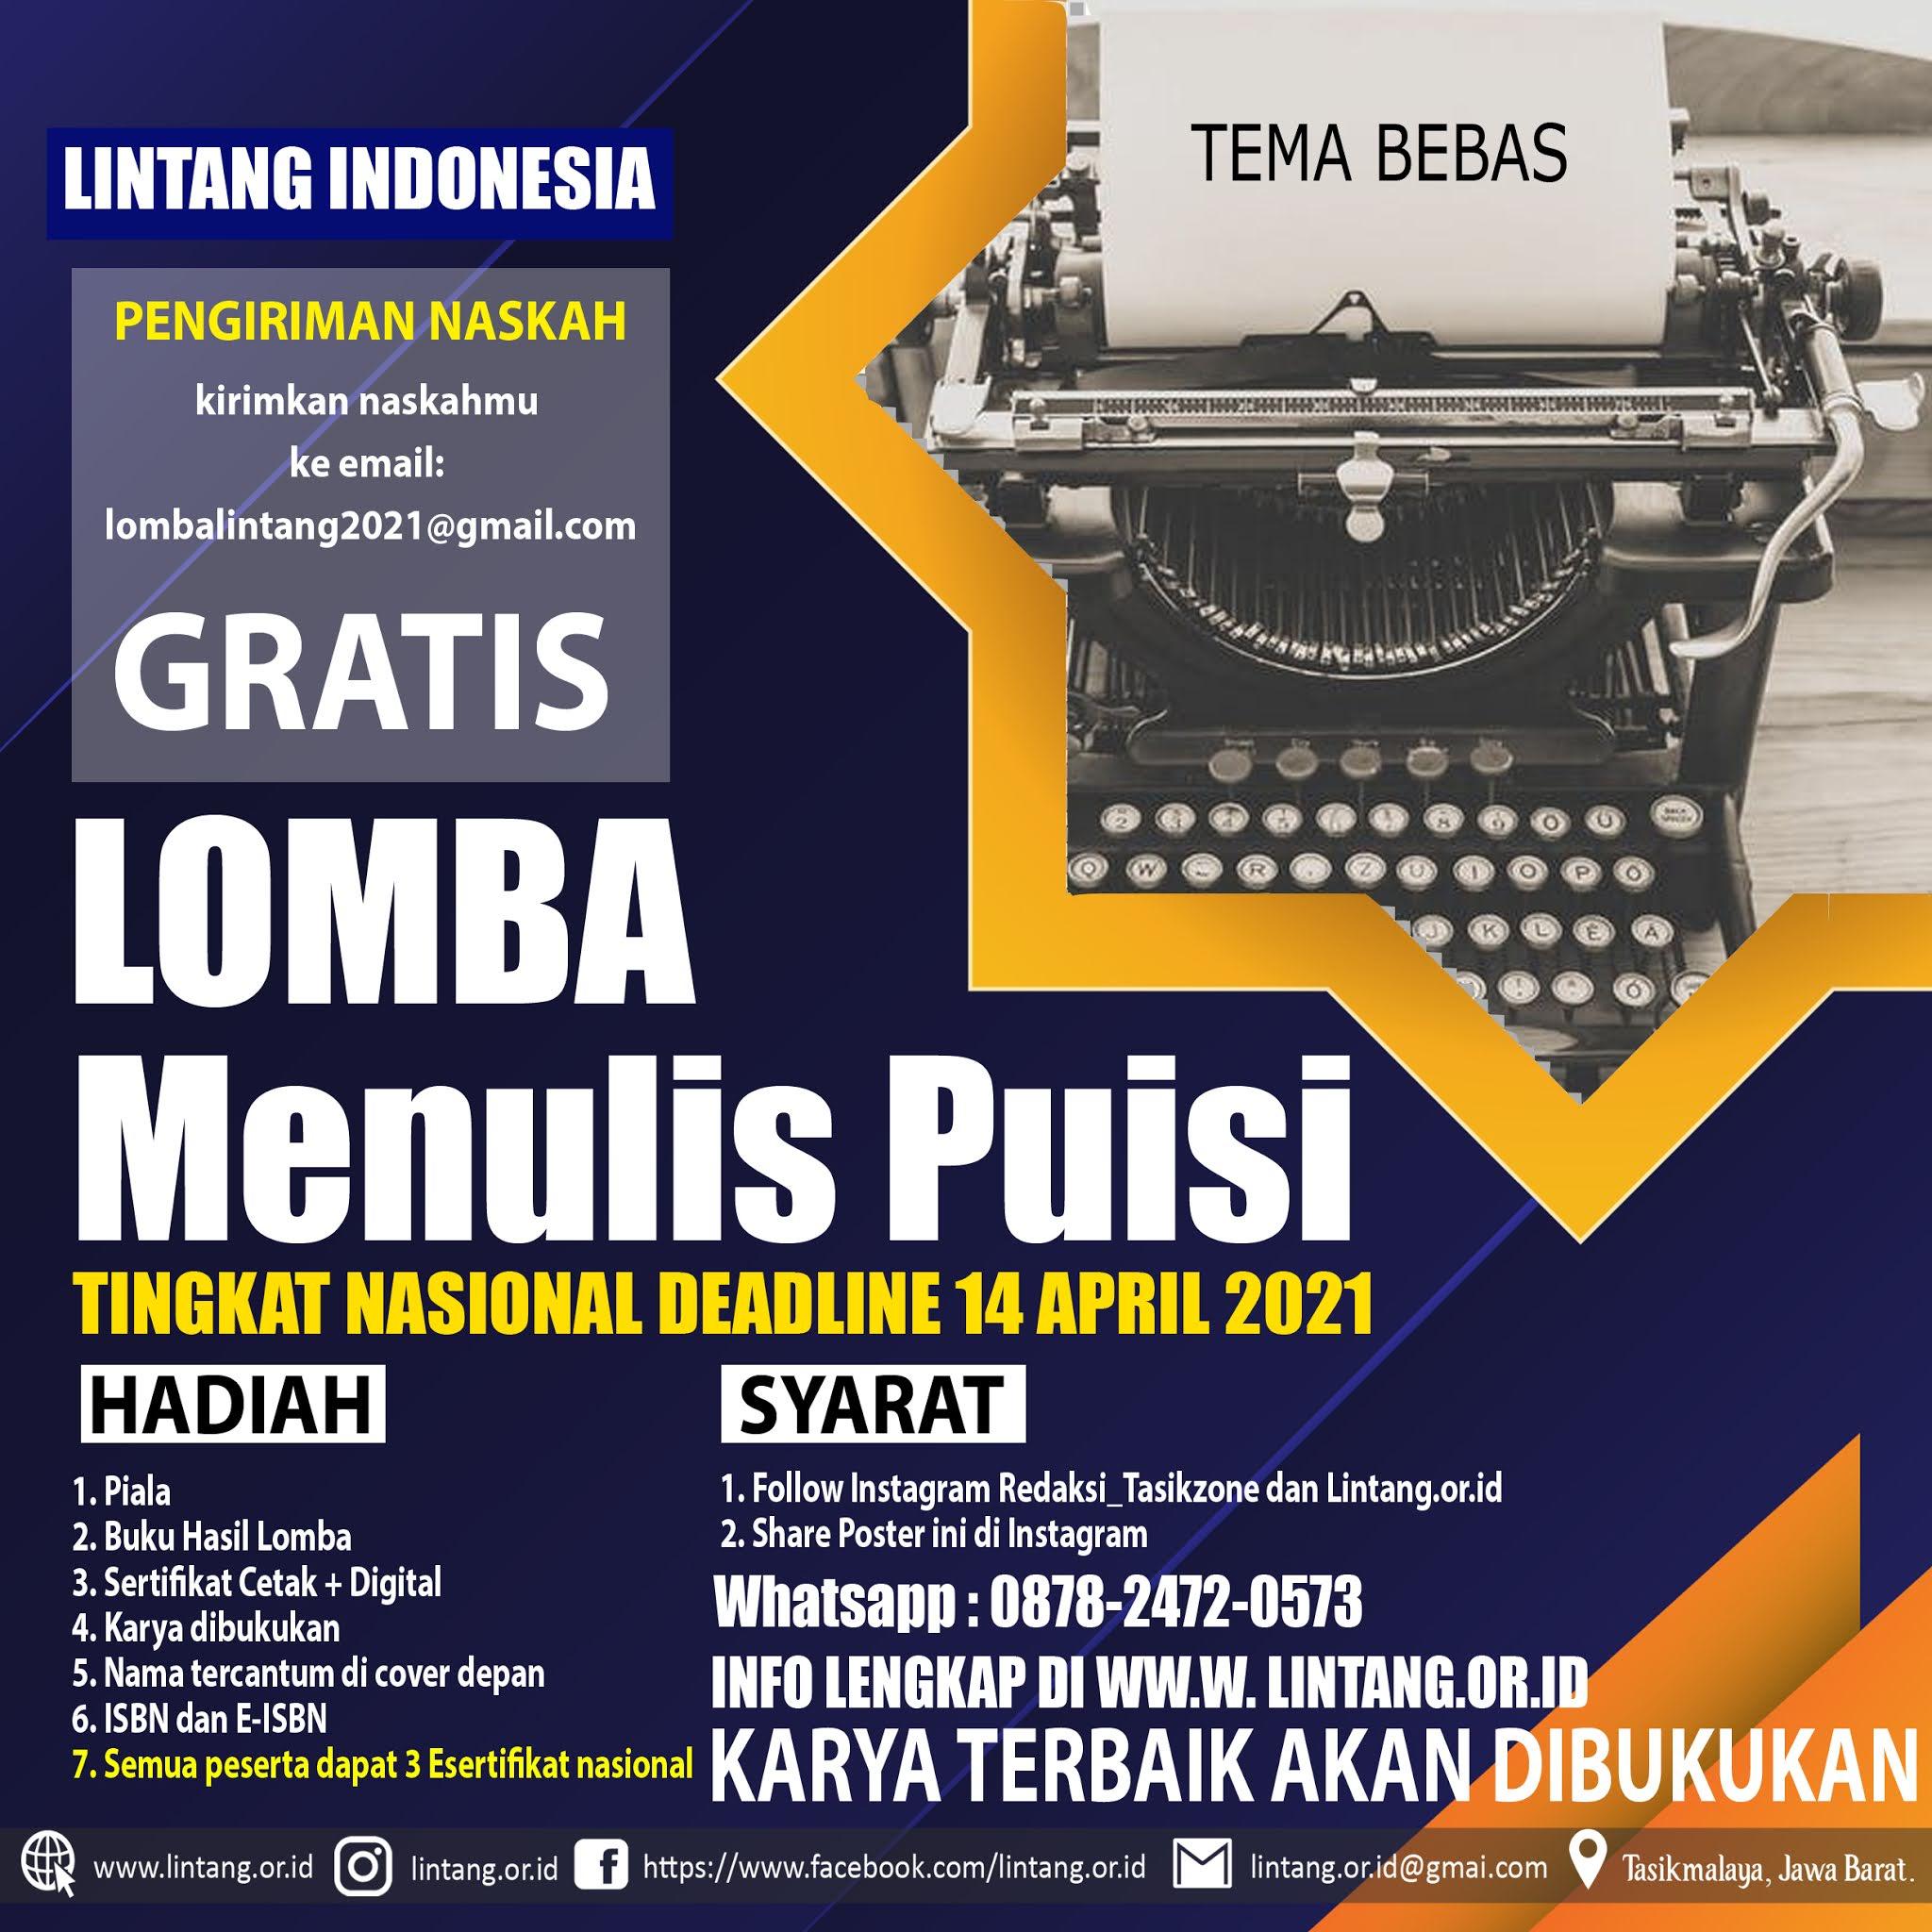 LOMBA CIPTA PUISI TINGKAT NASIONAL LINTANG INDONESIA DEADLINE 14 APRIL 2021